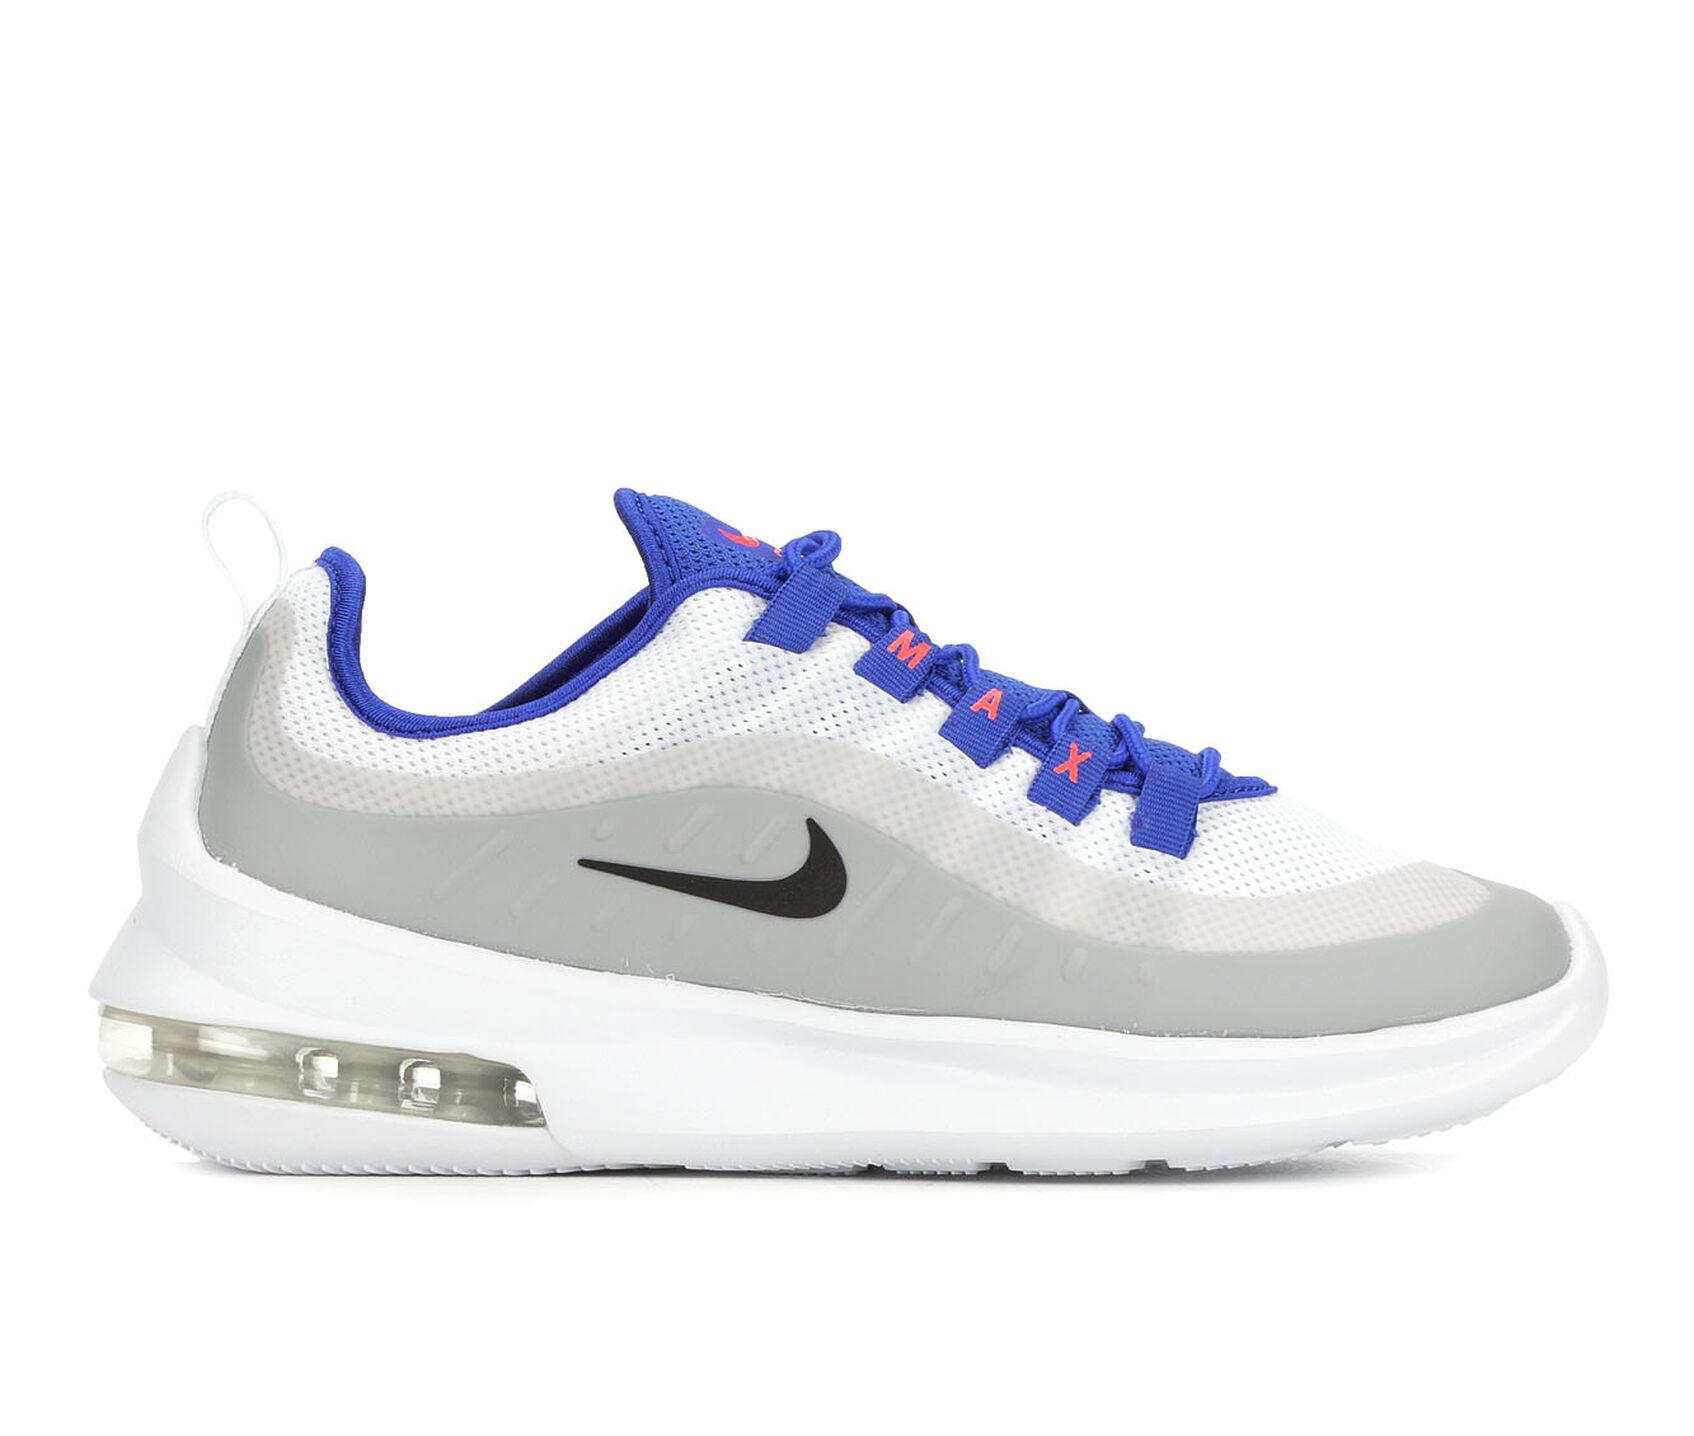 b4521ab7451 Women s Nike Air Max Axis Running Shoes